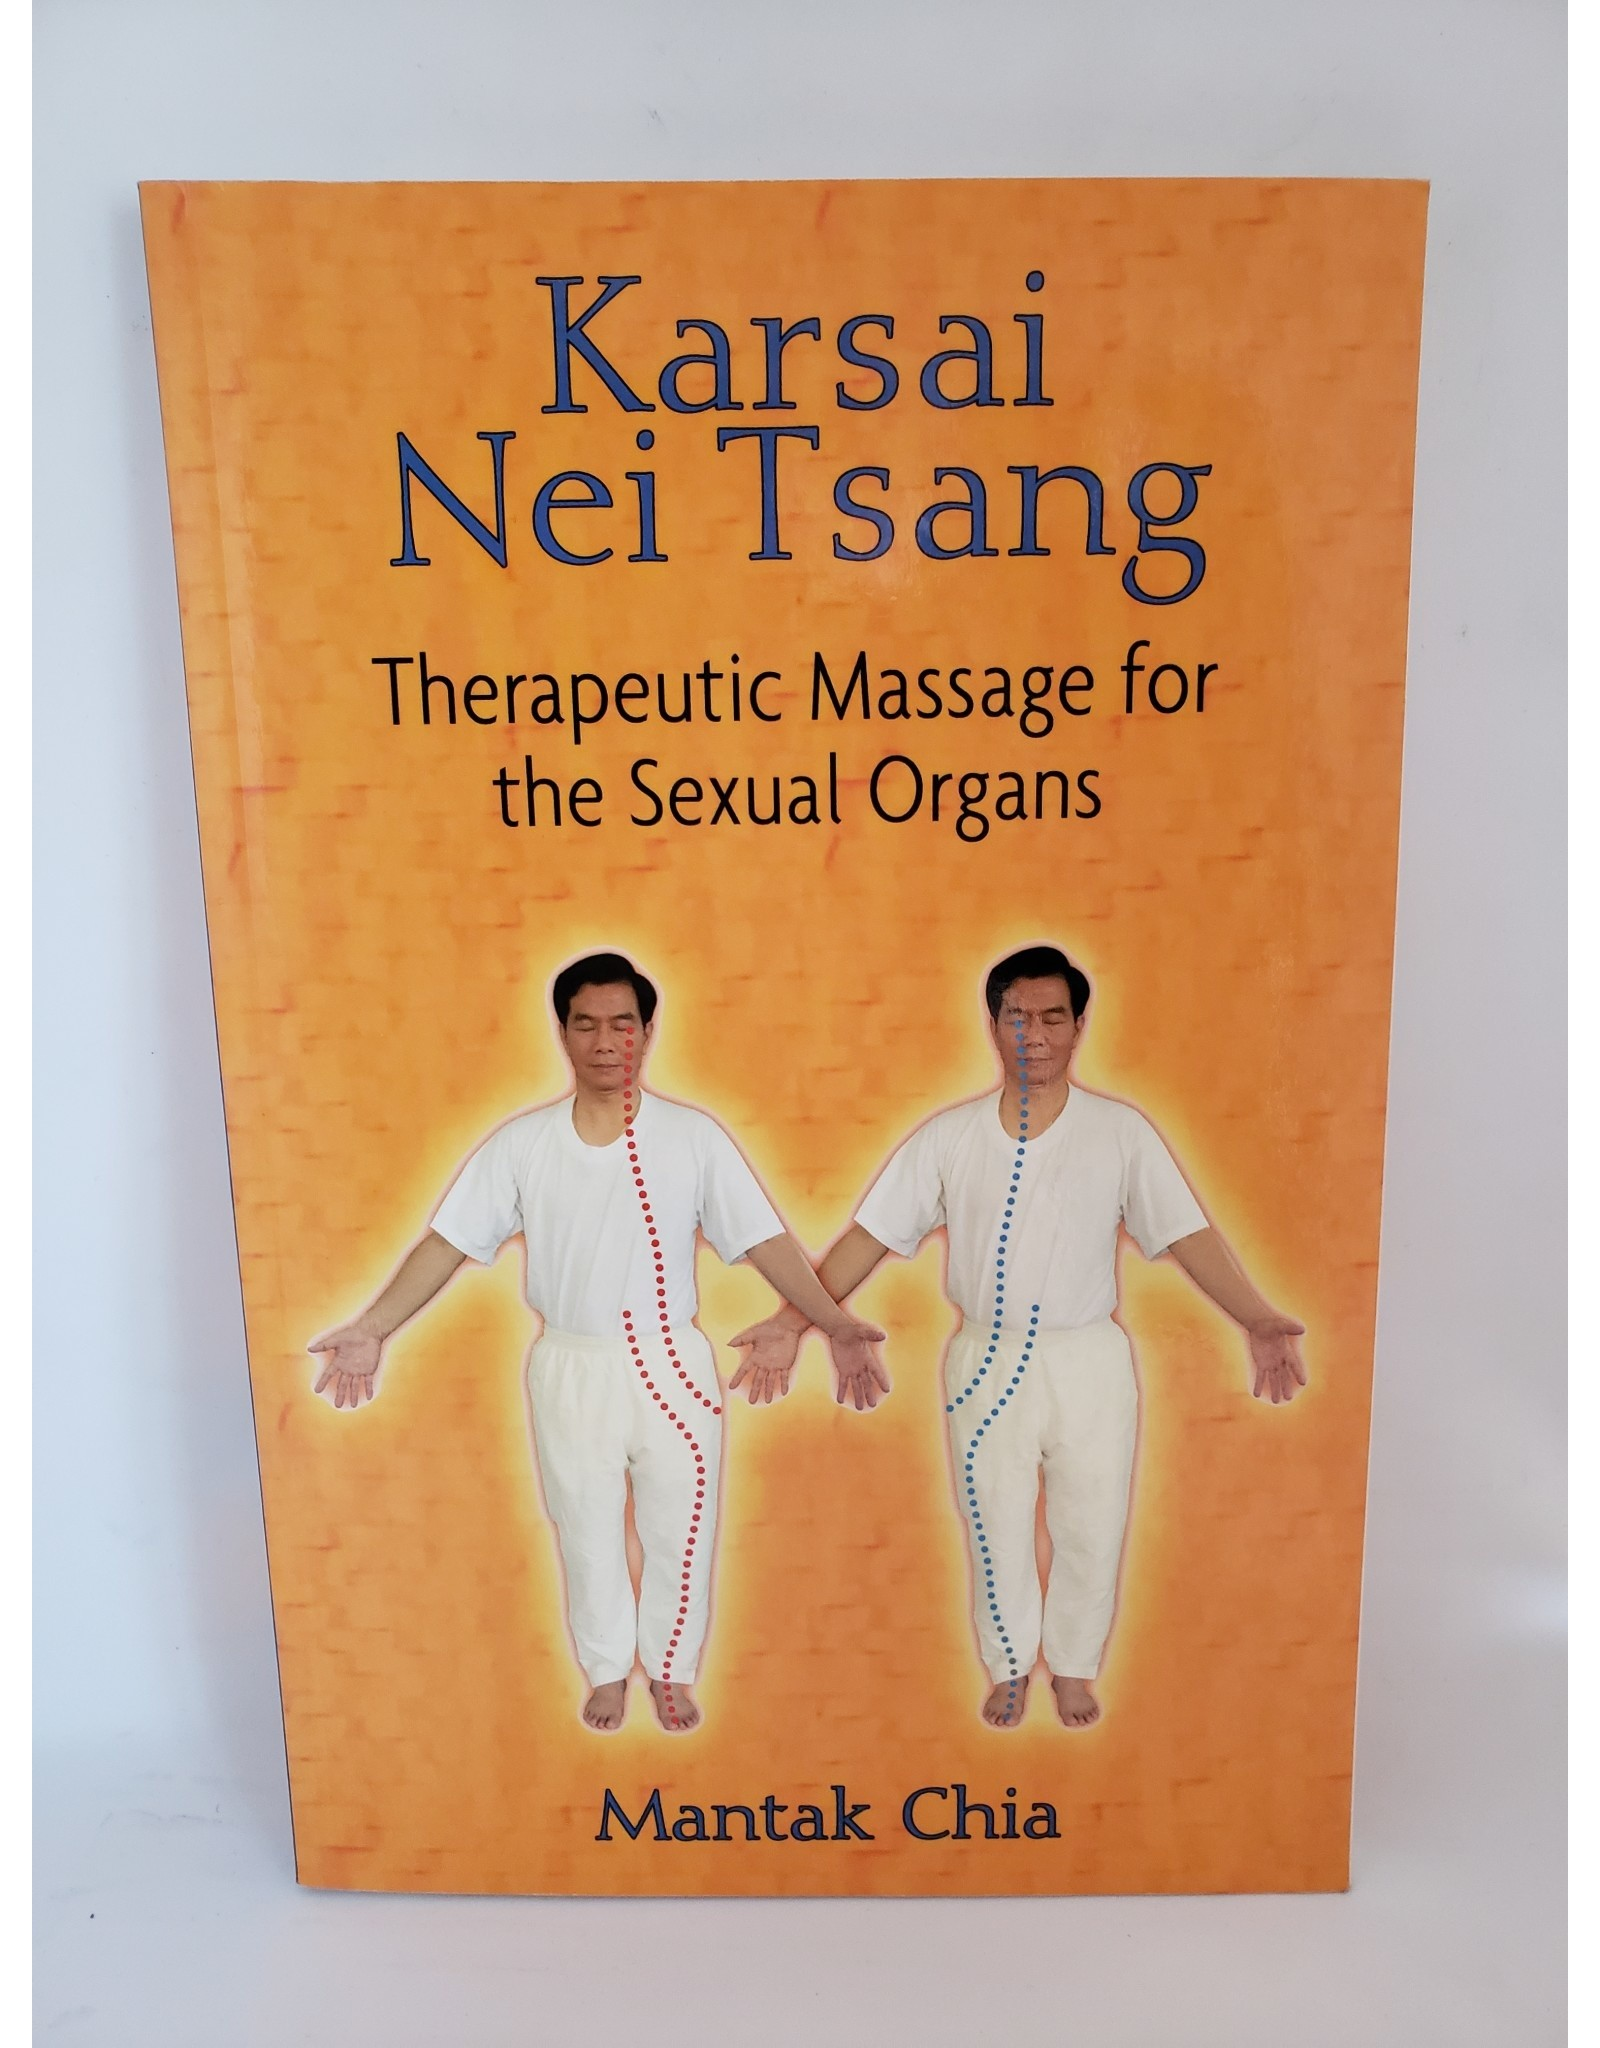 Karsai Nei Tsang: Therapeutic Massage For The Sexual Organs by Mantak Chia